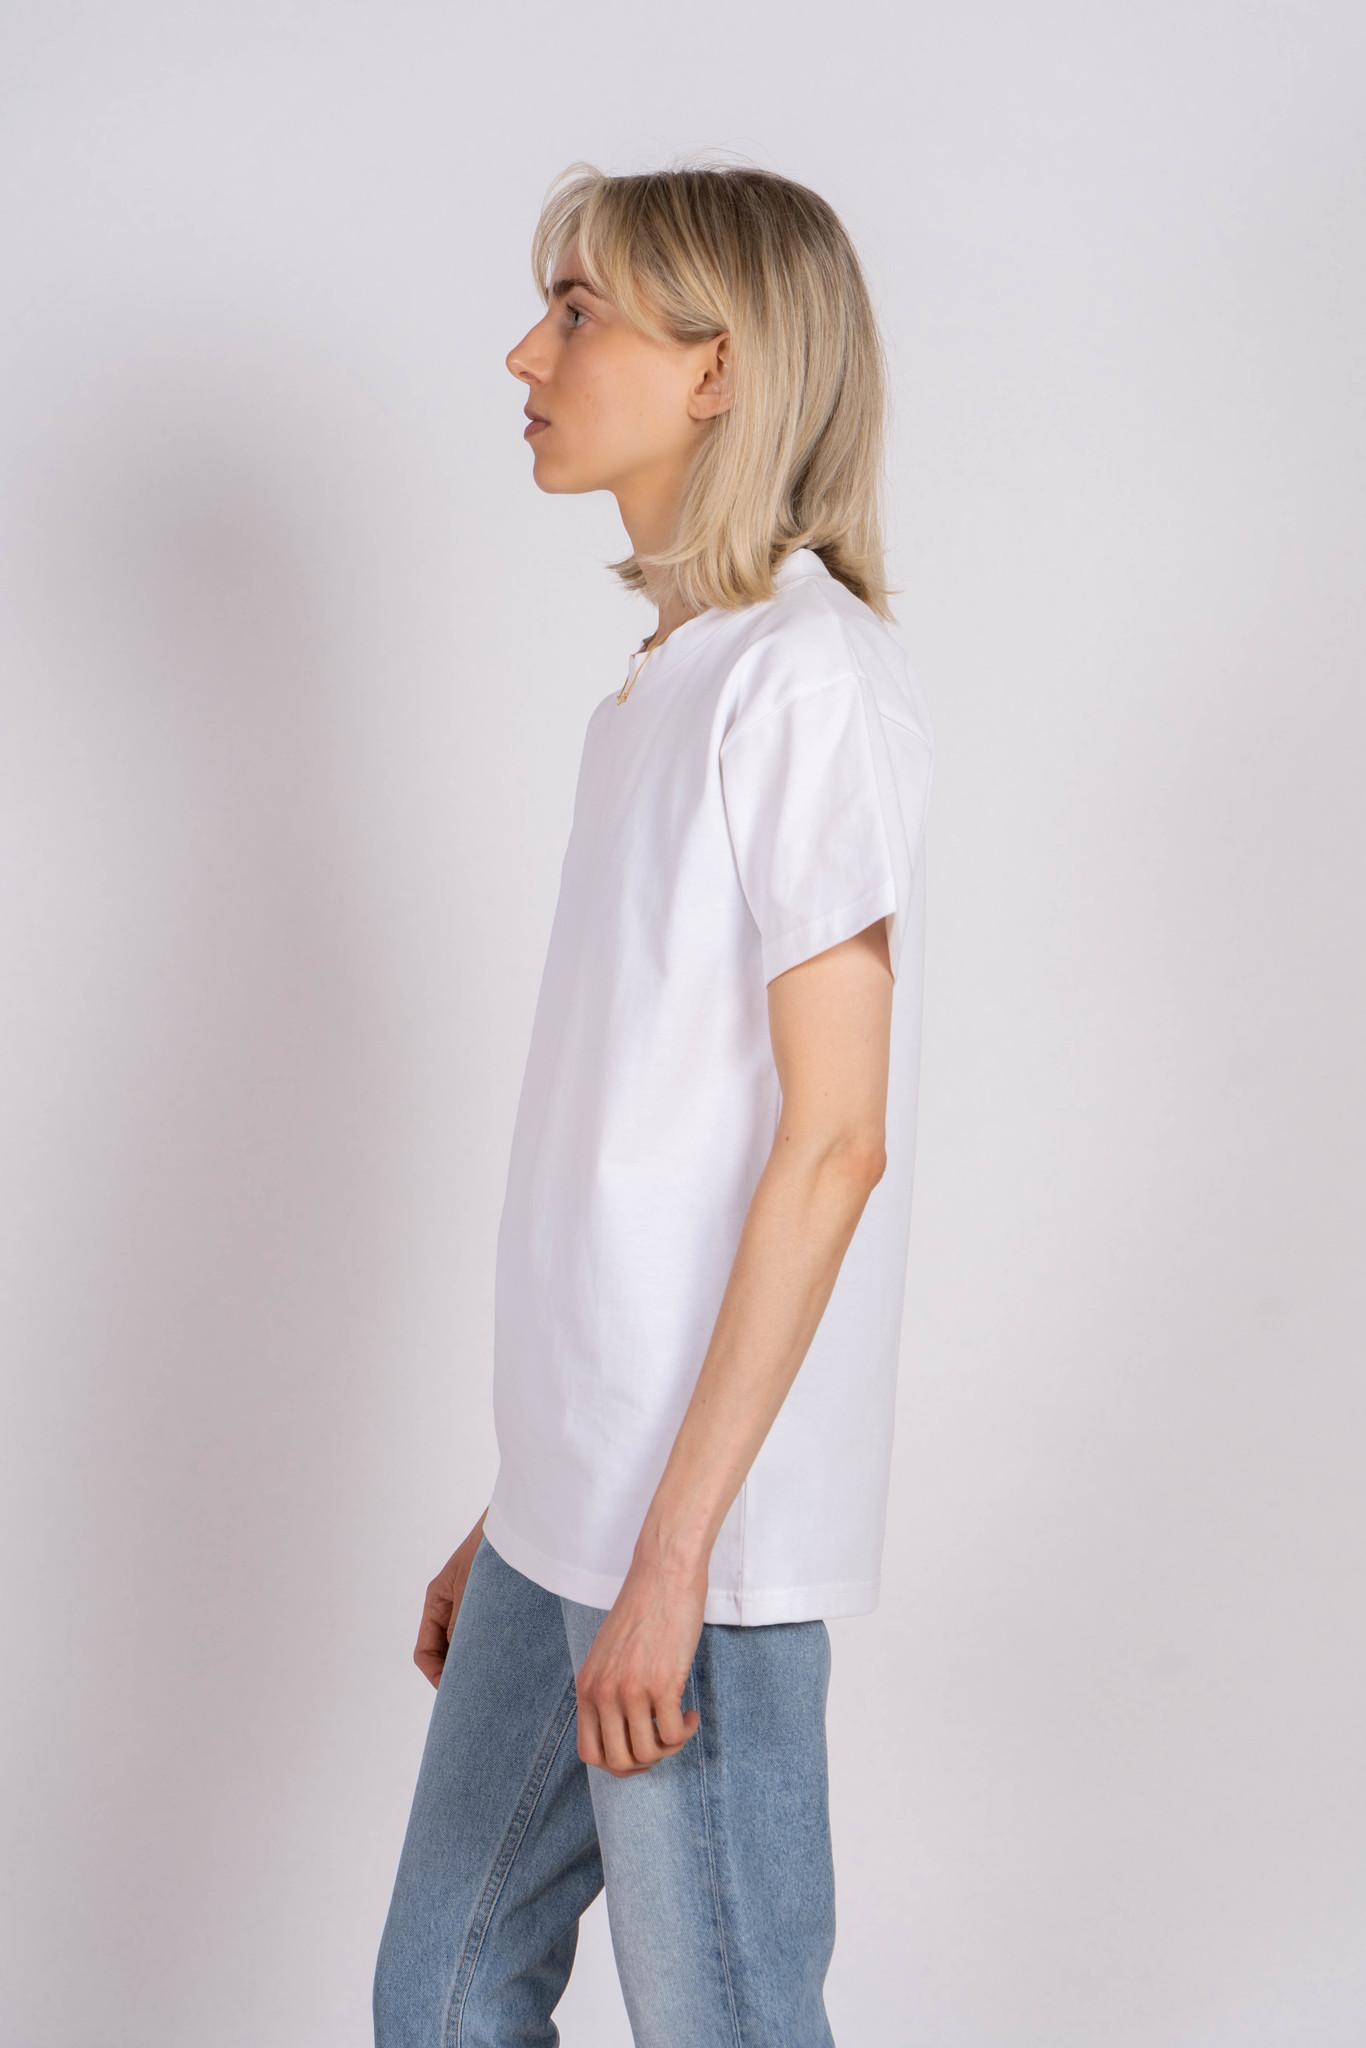 Boy T-shirt White Jersey